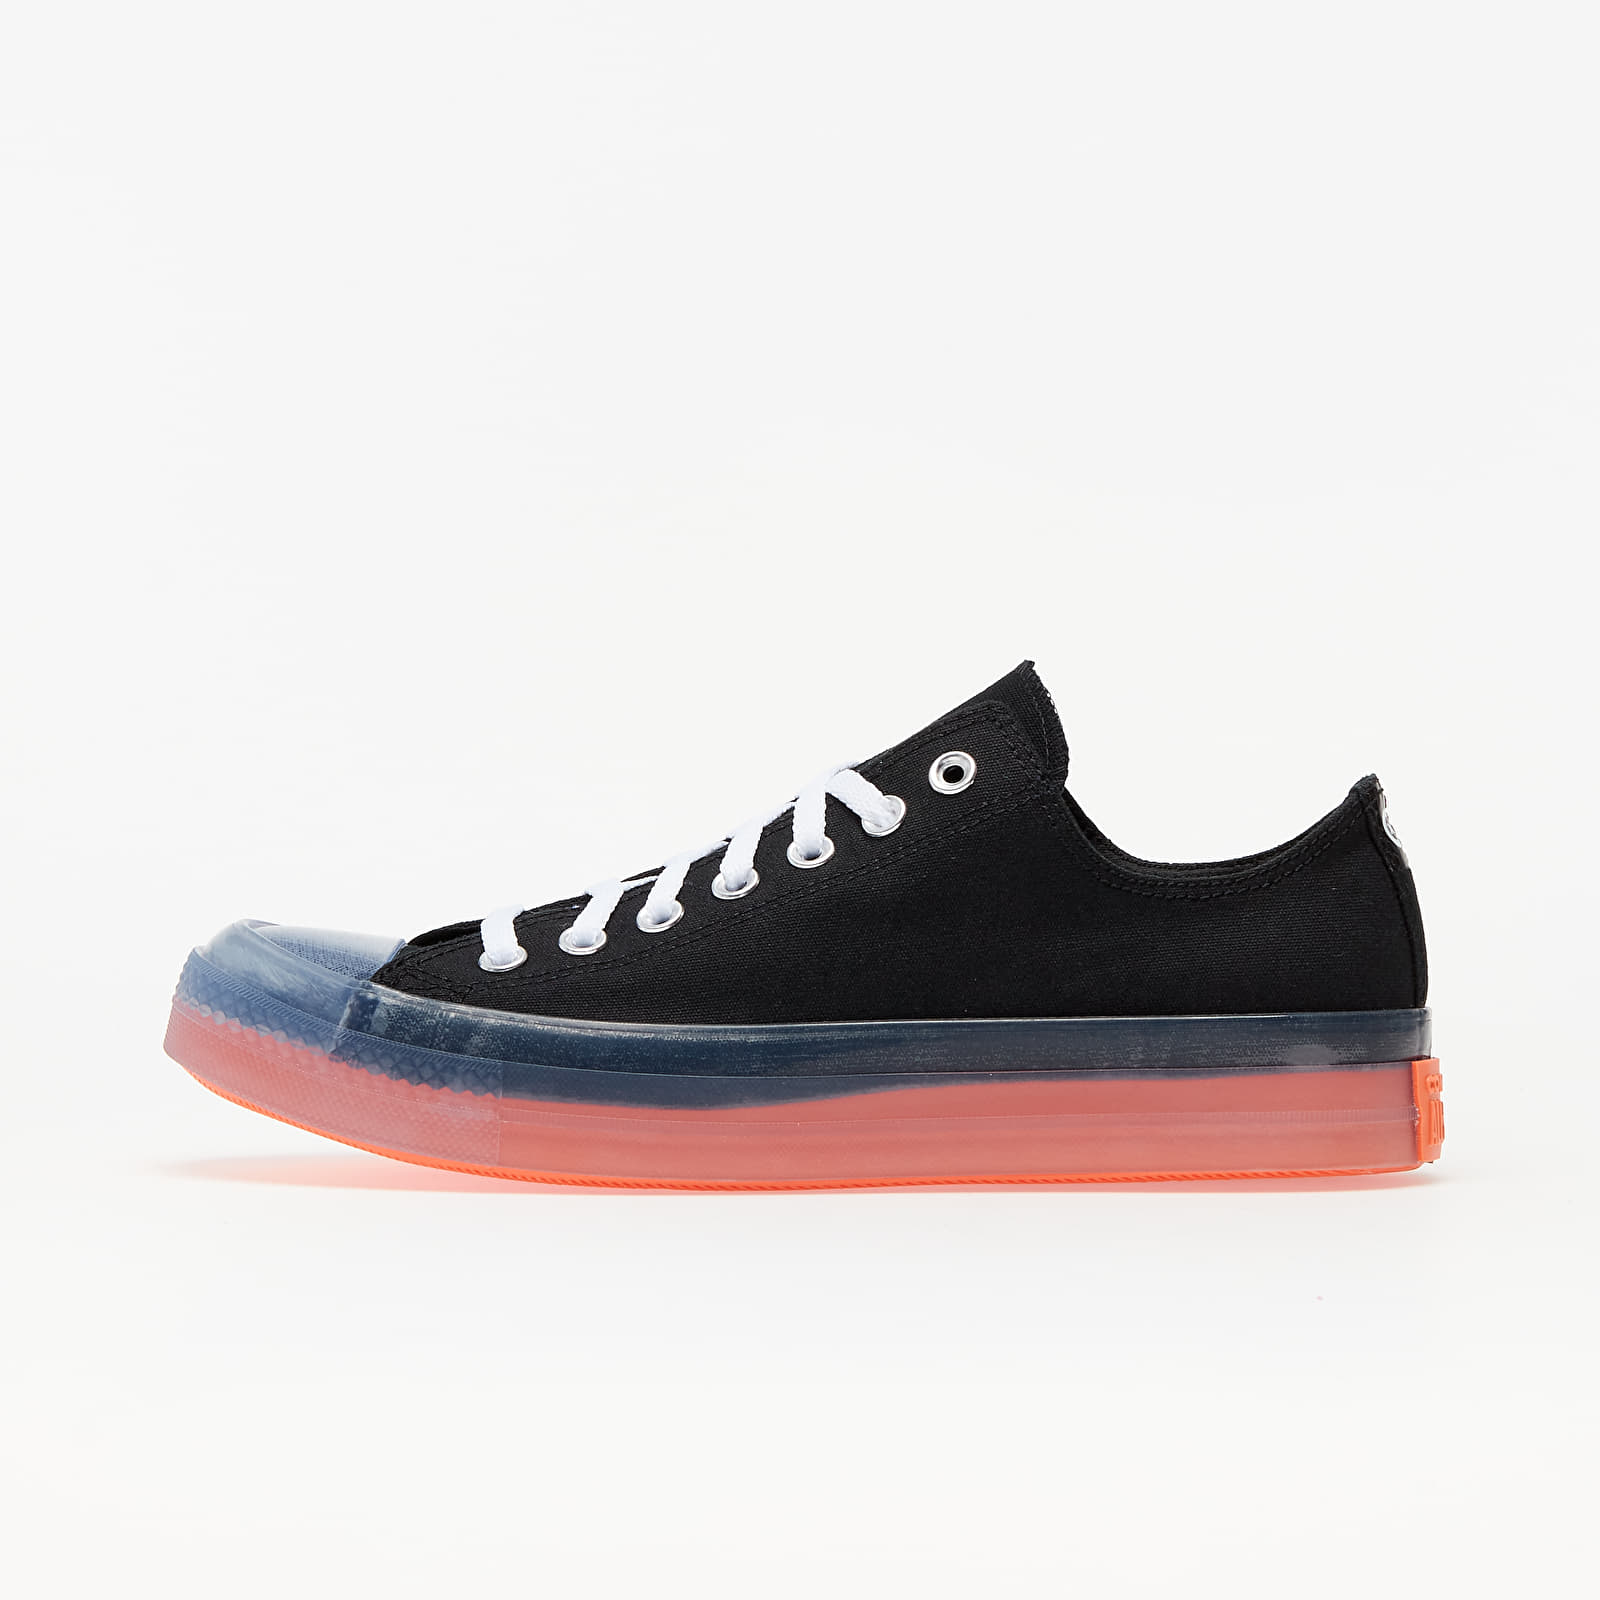 Pánske tenisky a topánky Converse Chuck Taylor All Star CX OX Black/ White/ Wild Mango